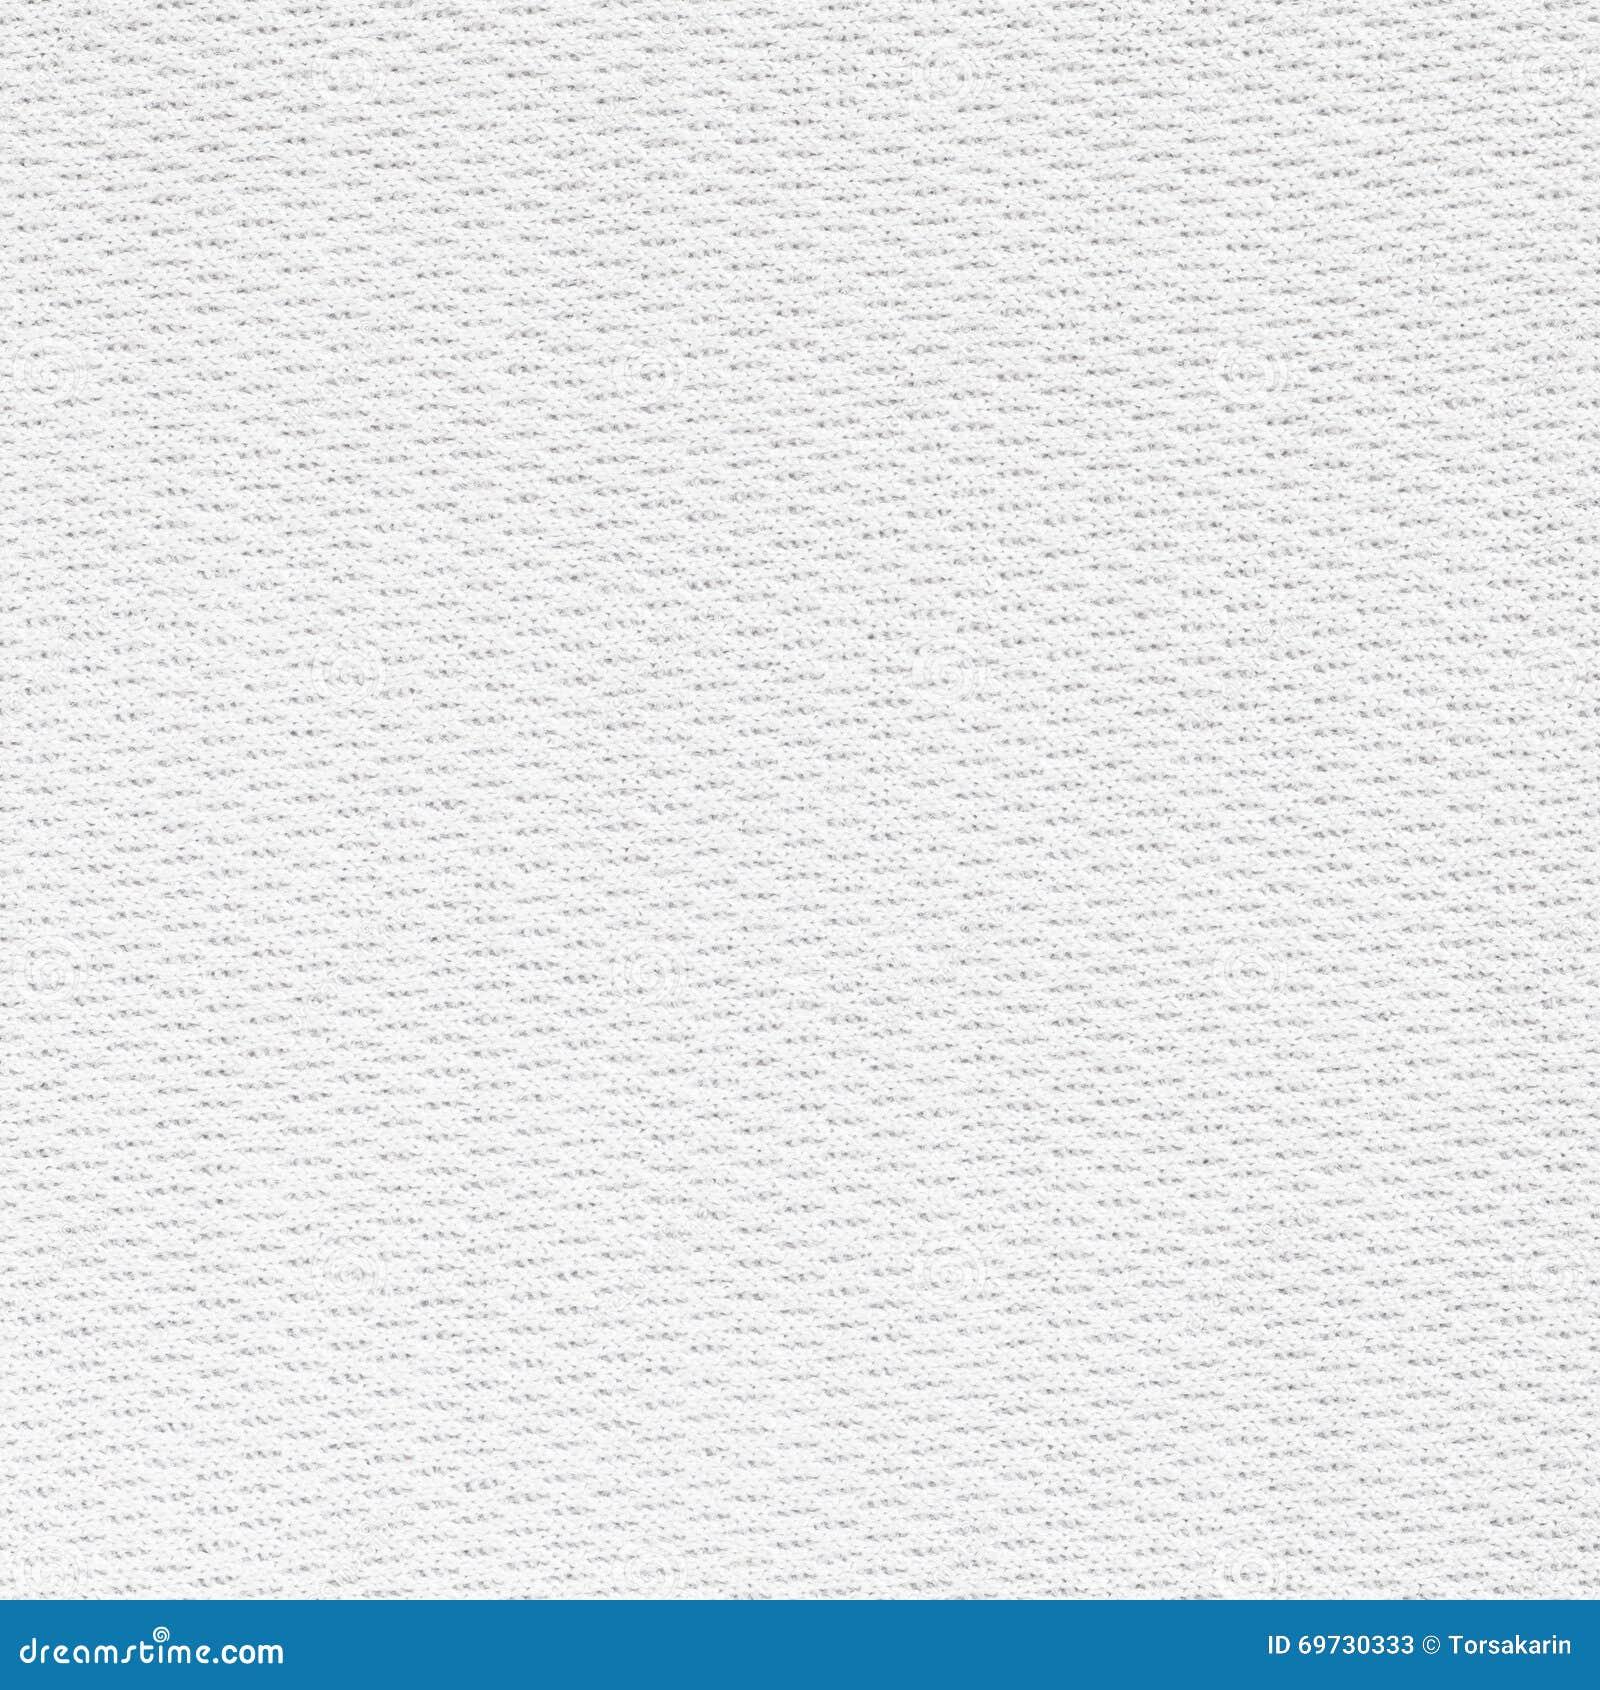 white cotton cloth background - photo #34